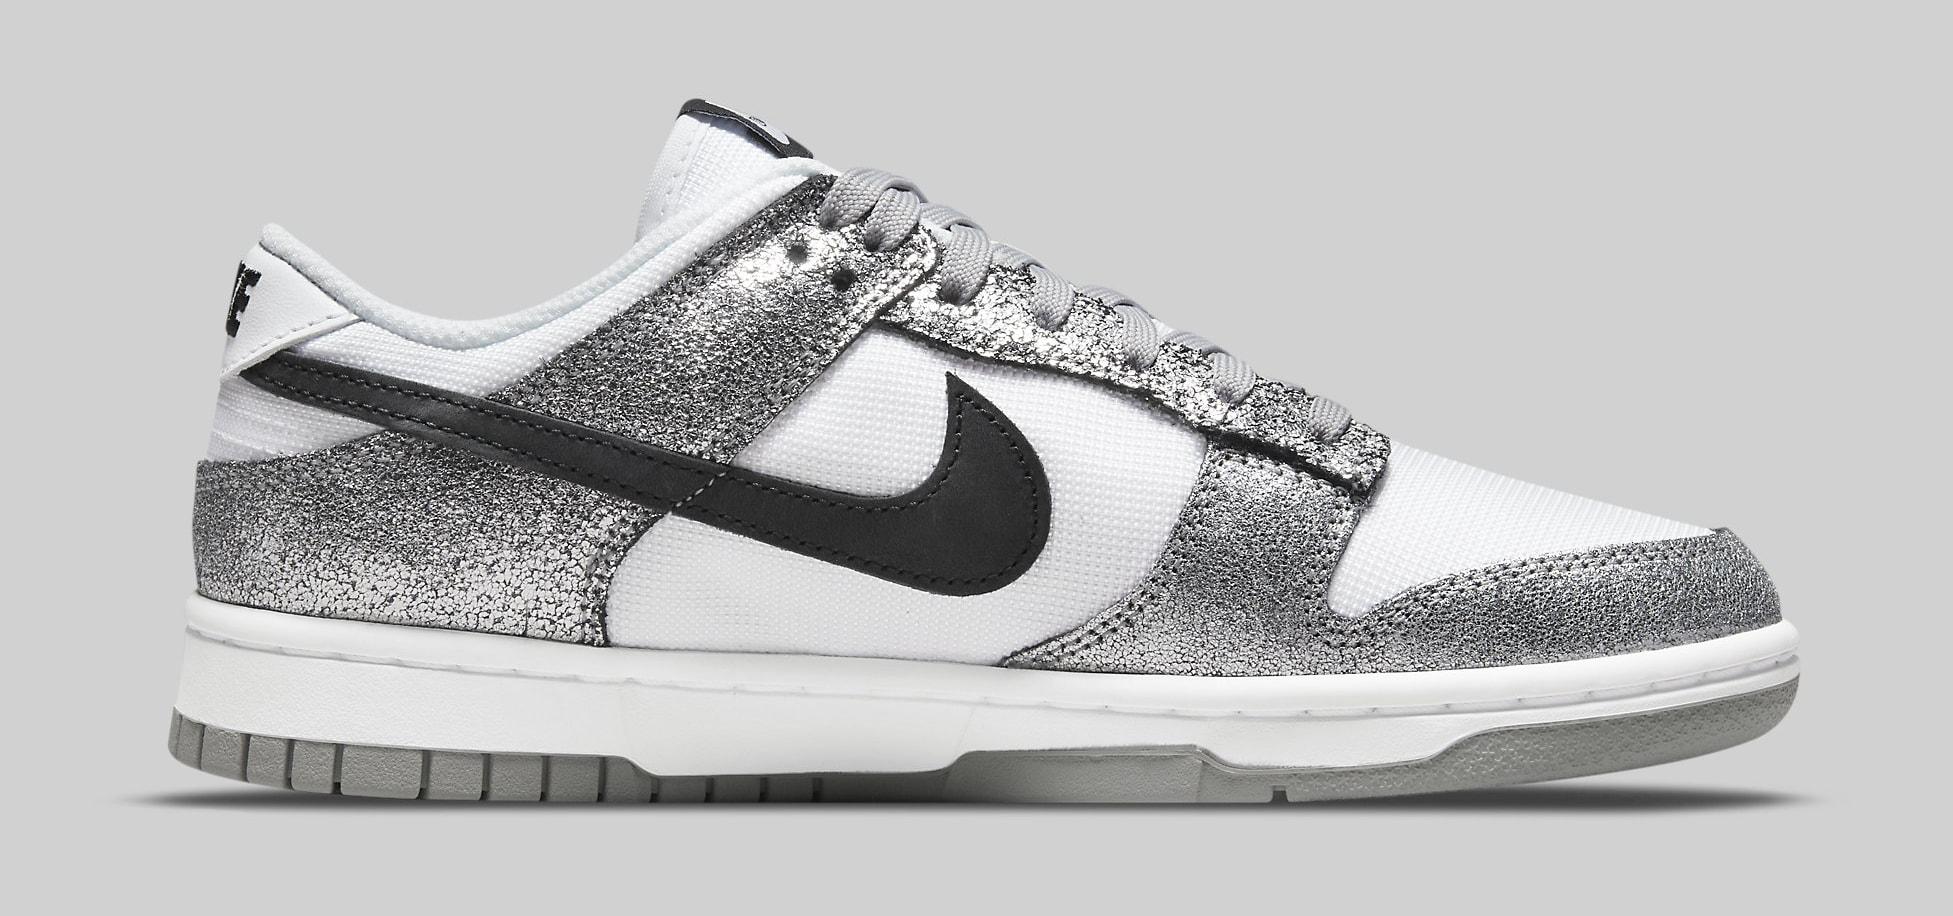 Nike Dunk Low 'Shimmer' DO5882-001 Medial